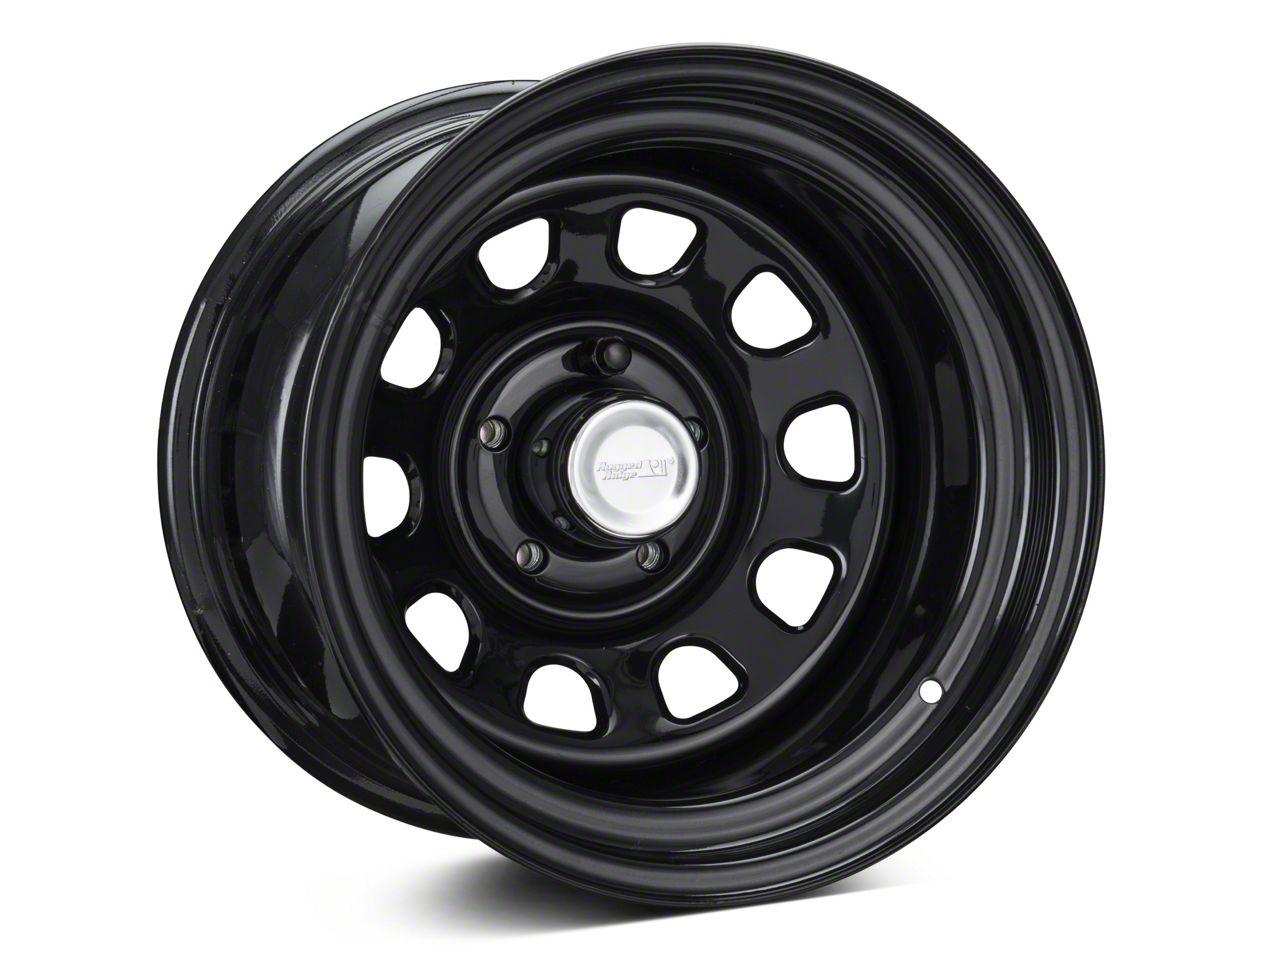 Rugged Ridge D-Window Black Steel Wheel 15x10 Wheel & Mickey Thompson Deegan 38 31x10.50R15 Tire Kit (87-06 Jeep Wrangler YJ & TJ)